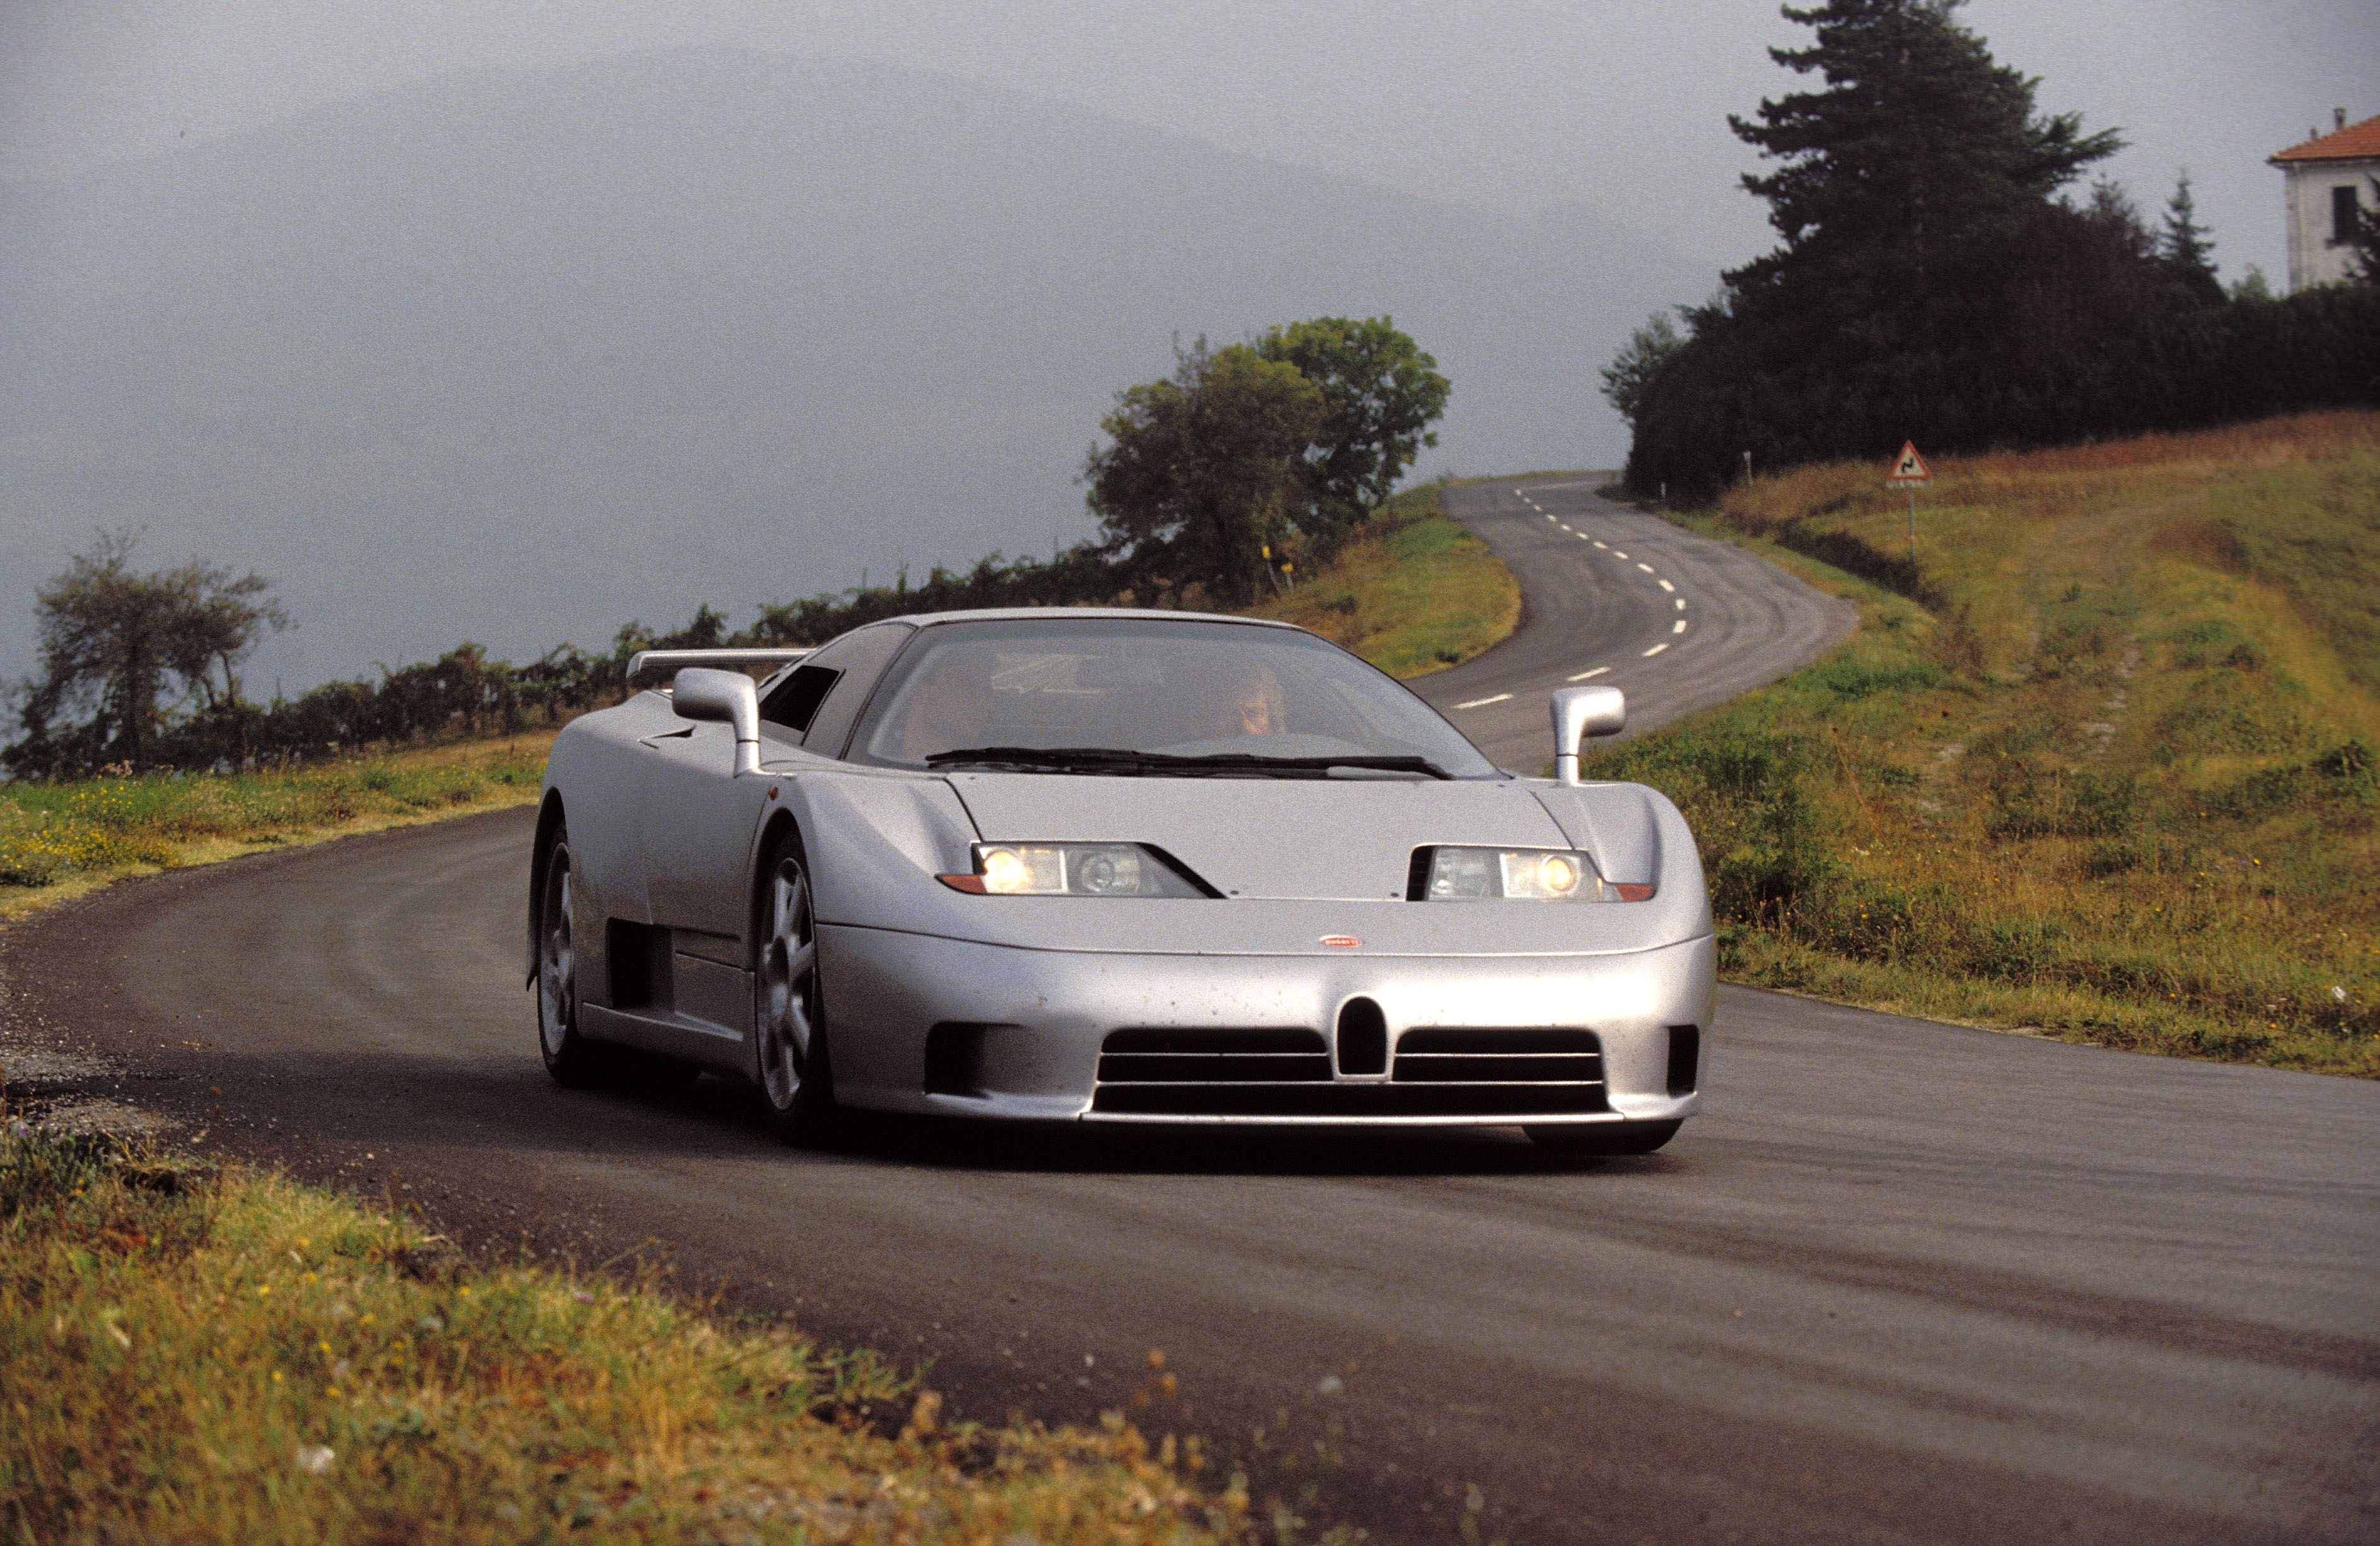 Bugatti Might Reveal an EB110 Tribute at Pebble Beach